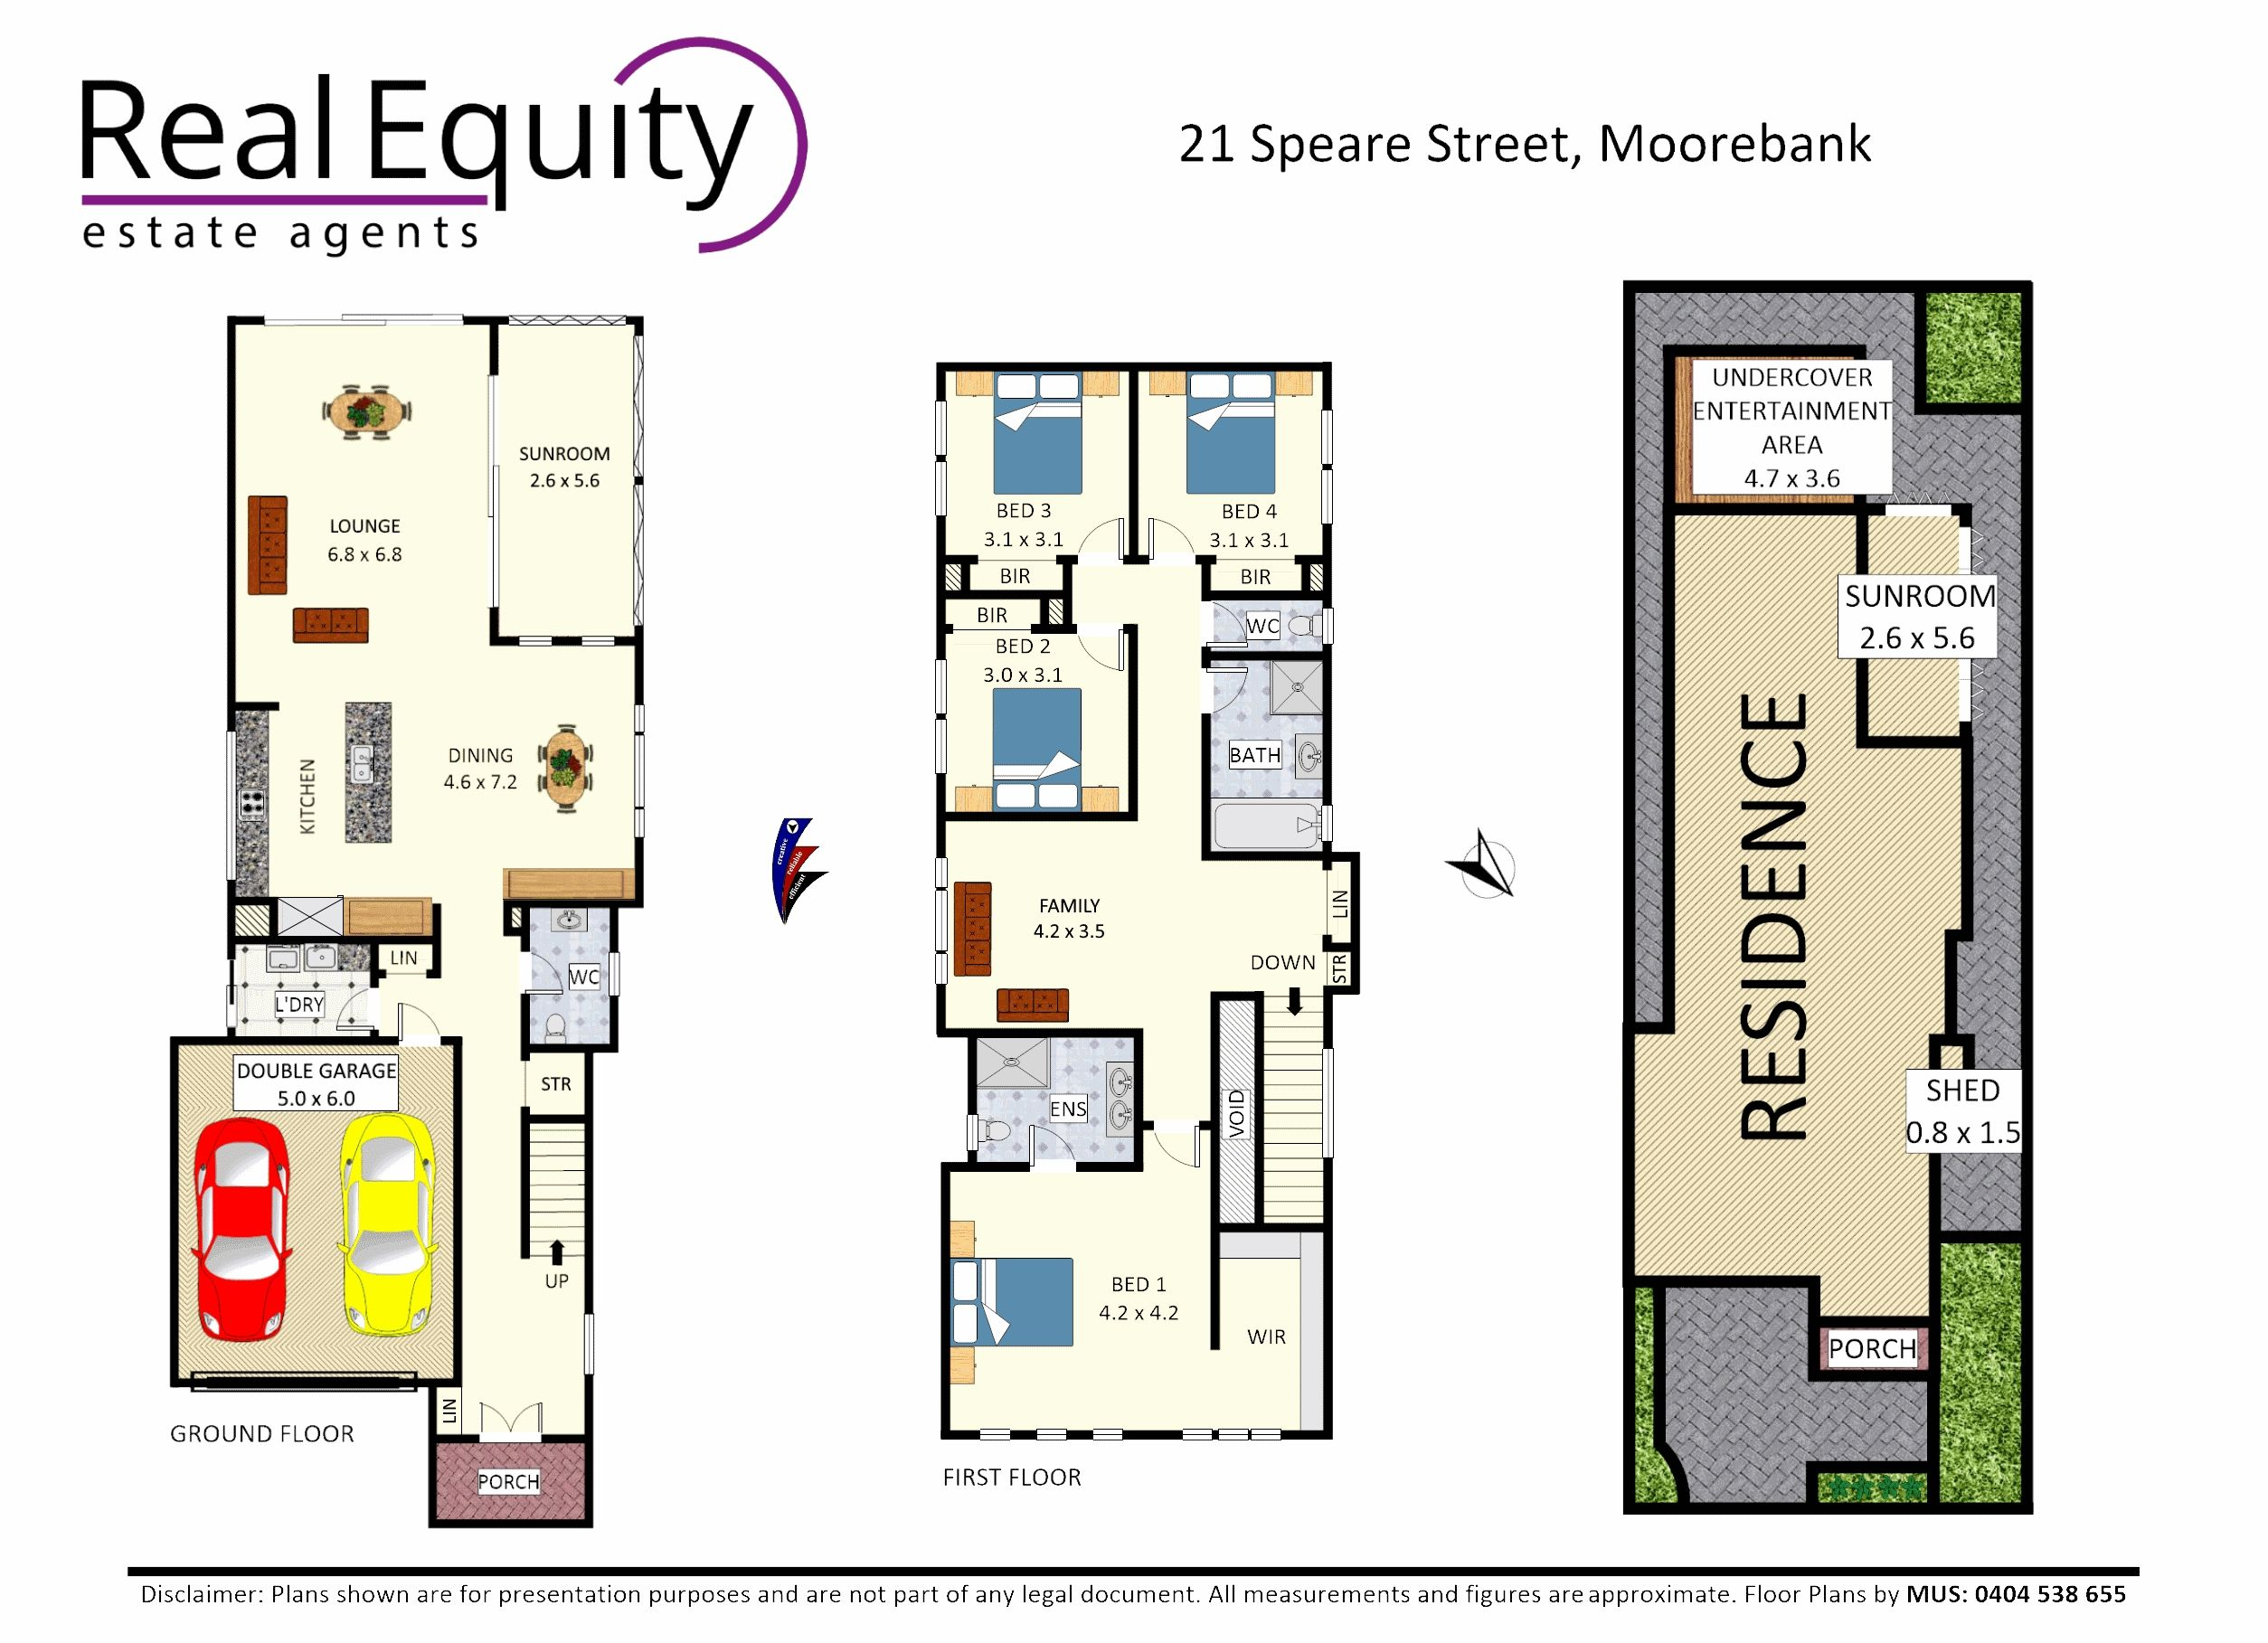 Property Report for 21 Speare Street, Moorebank NSW 2170